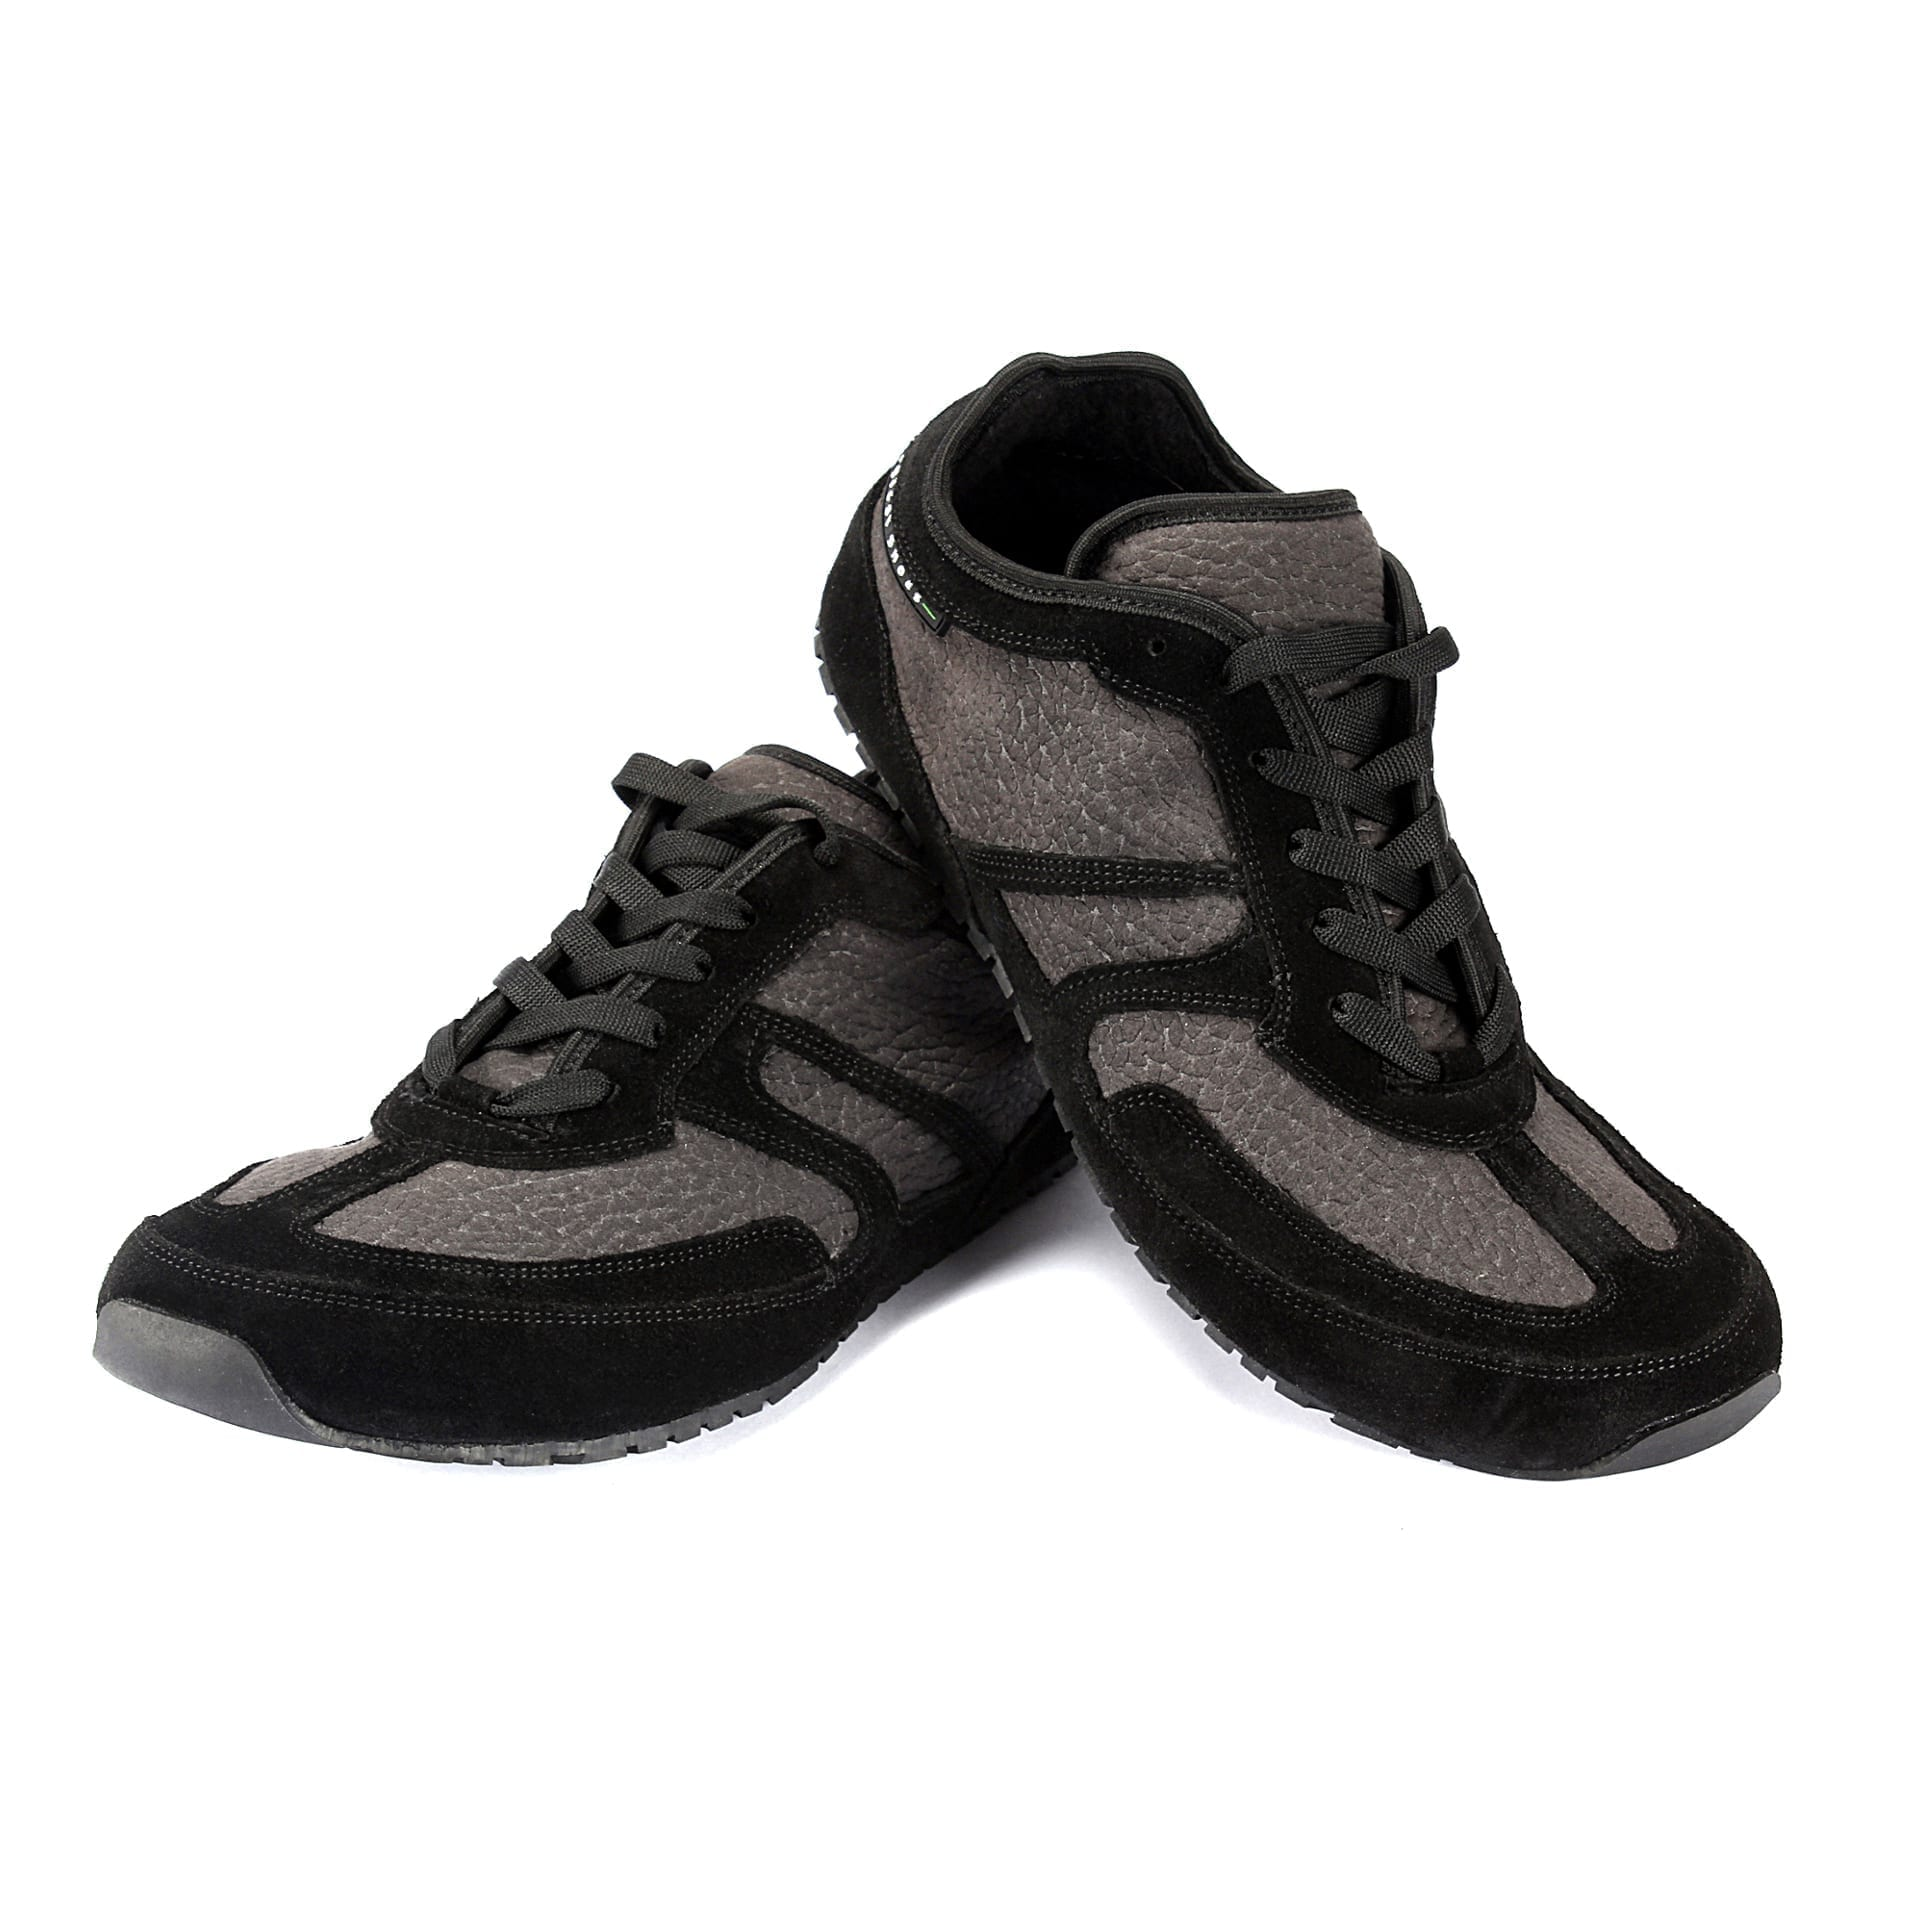 Magical Shoes BAREFOOT SHOES EXPLORER AUTUMN BARIBAL picture 1